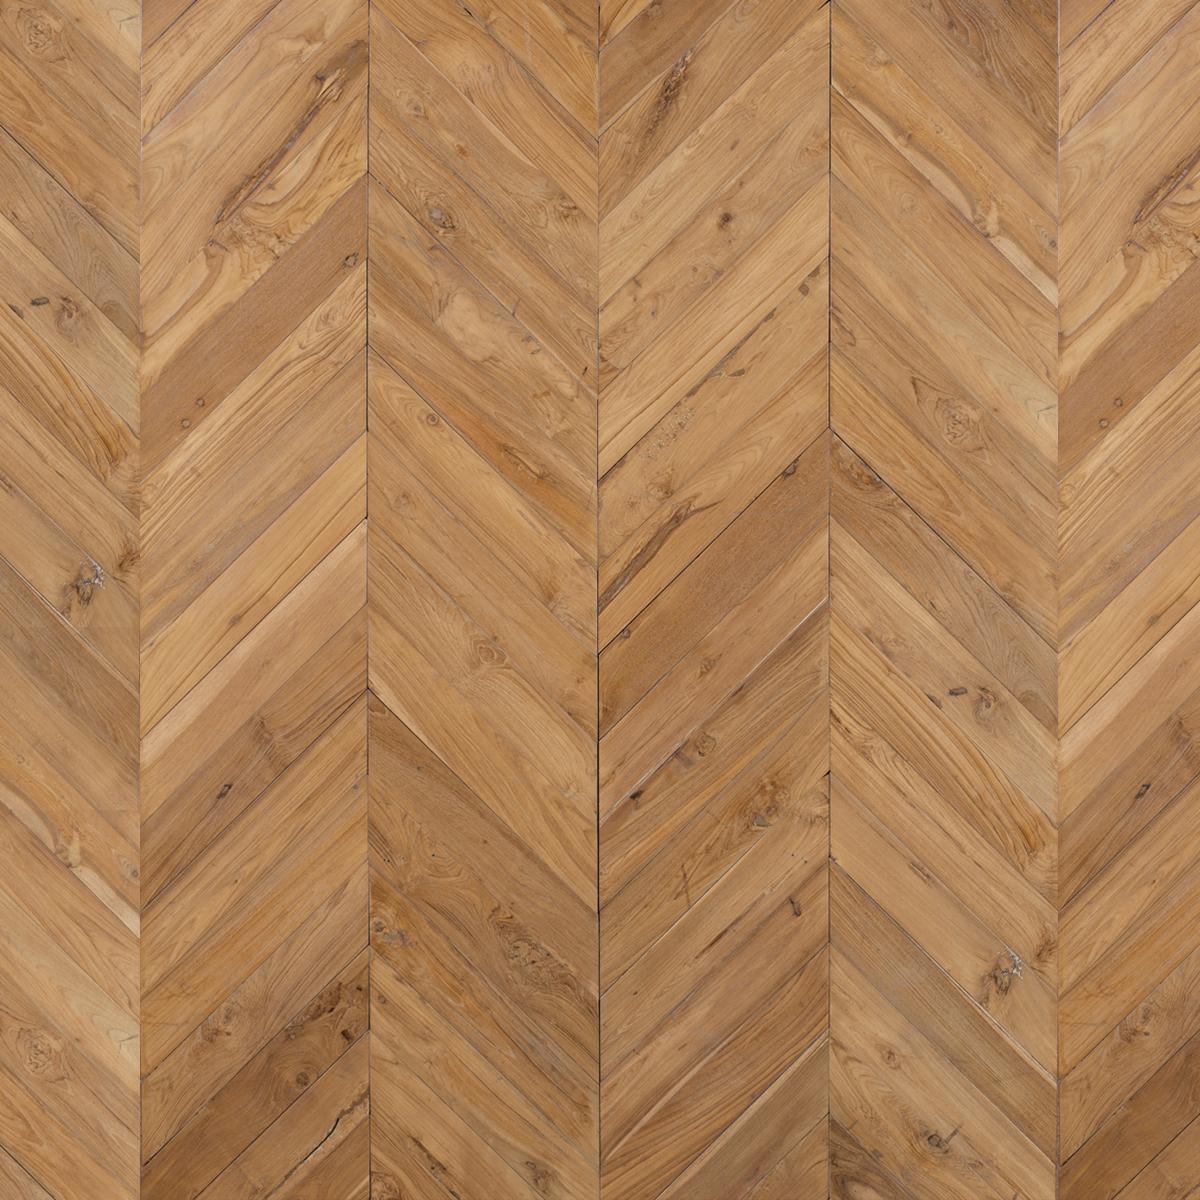 Antique Wooden Floors Artepronta